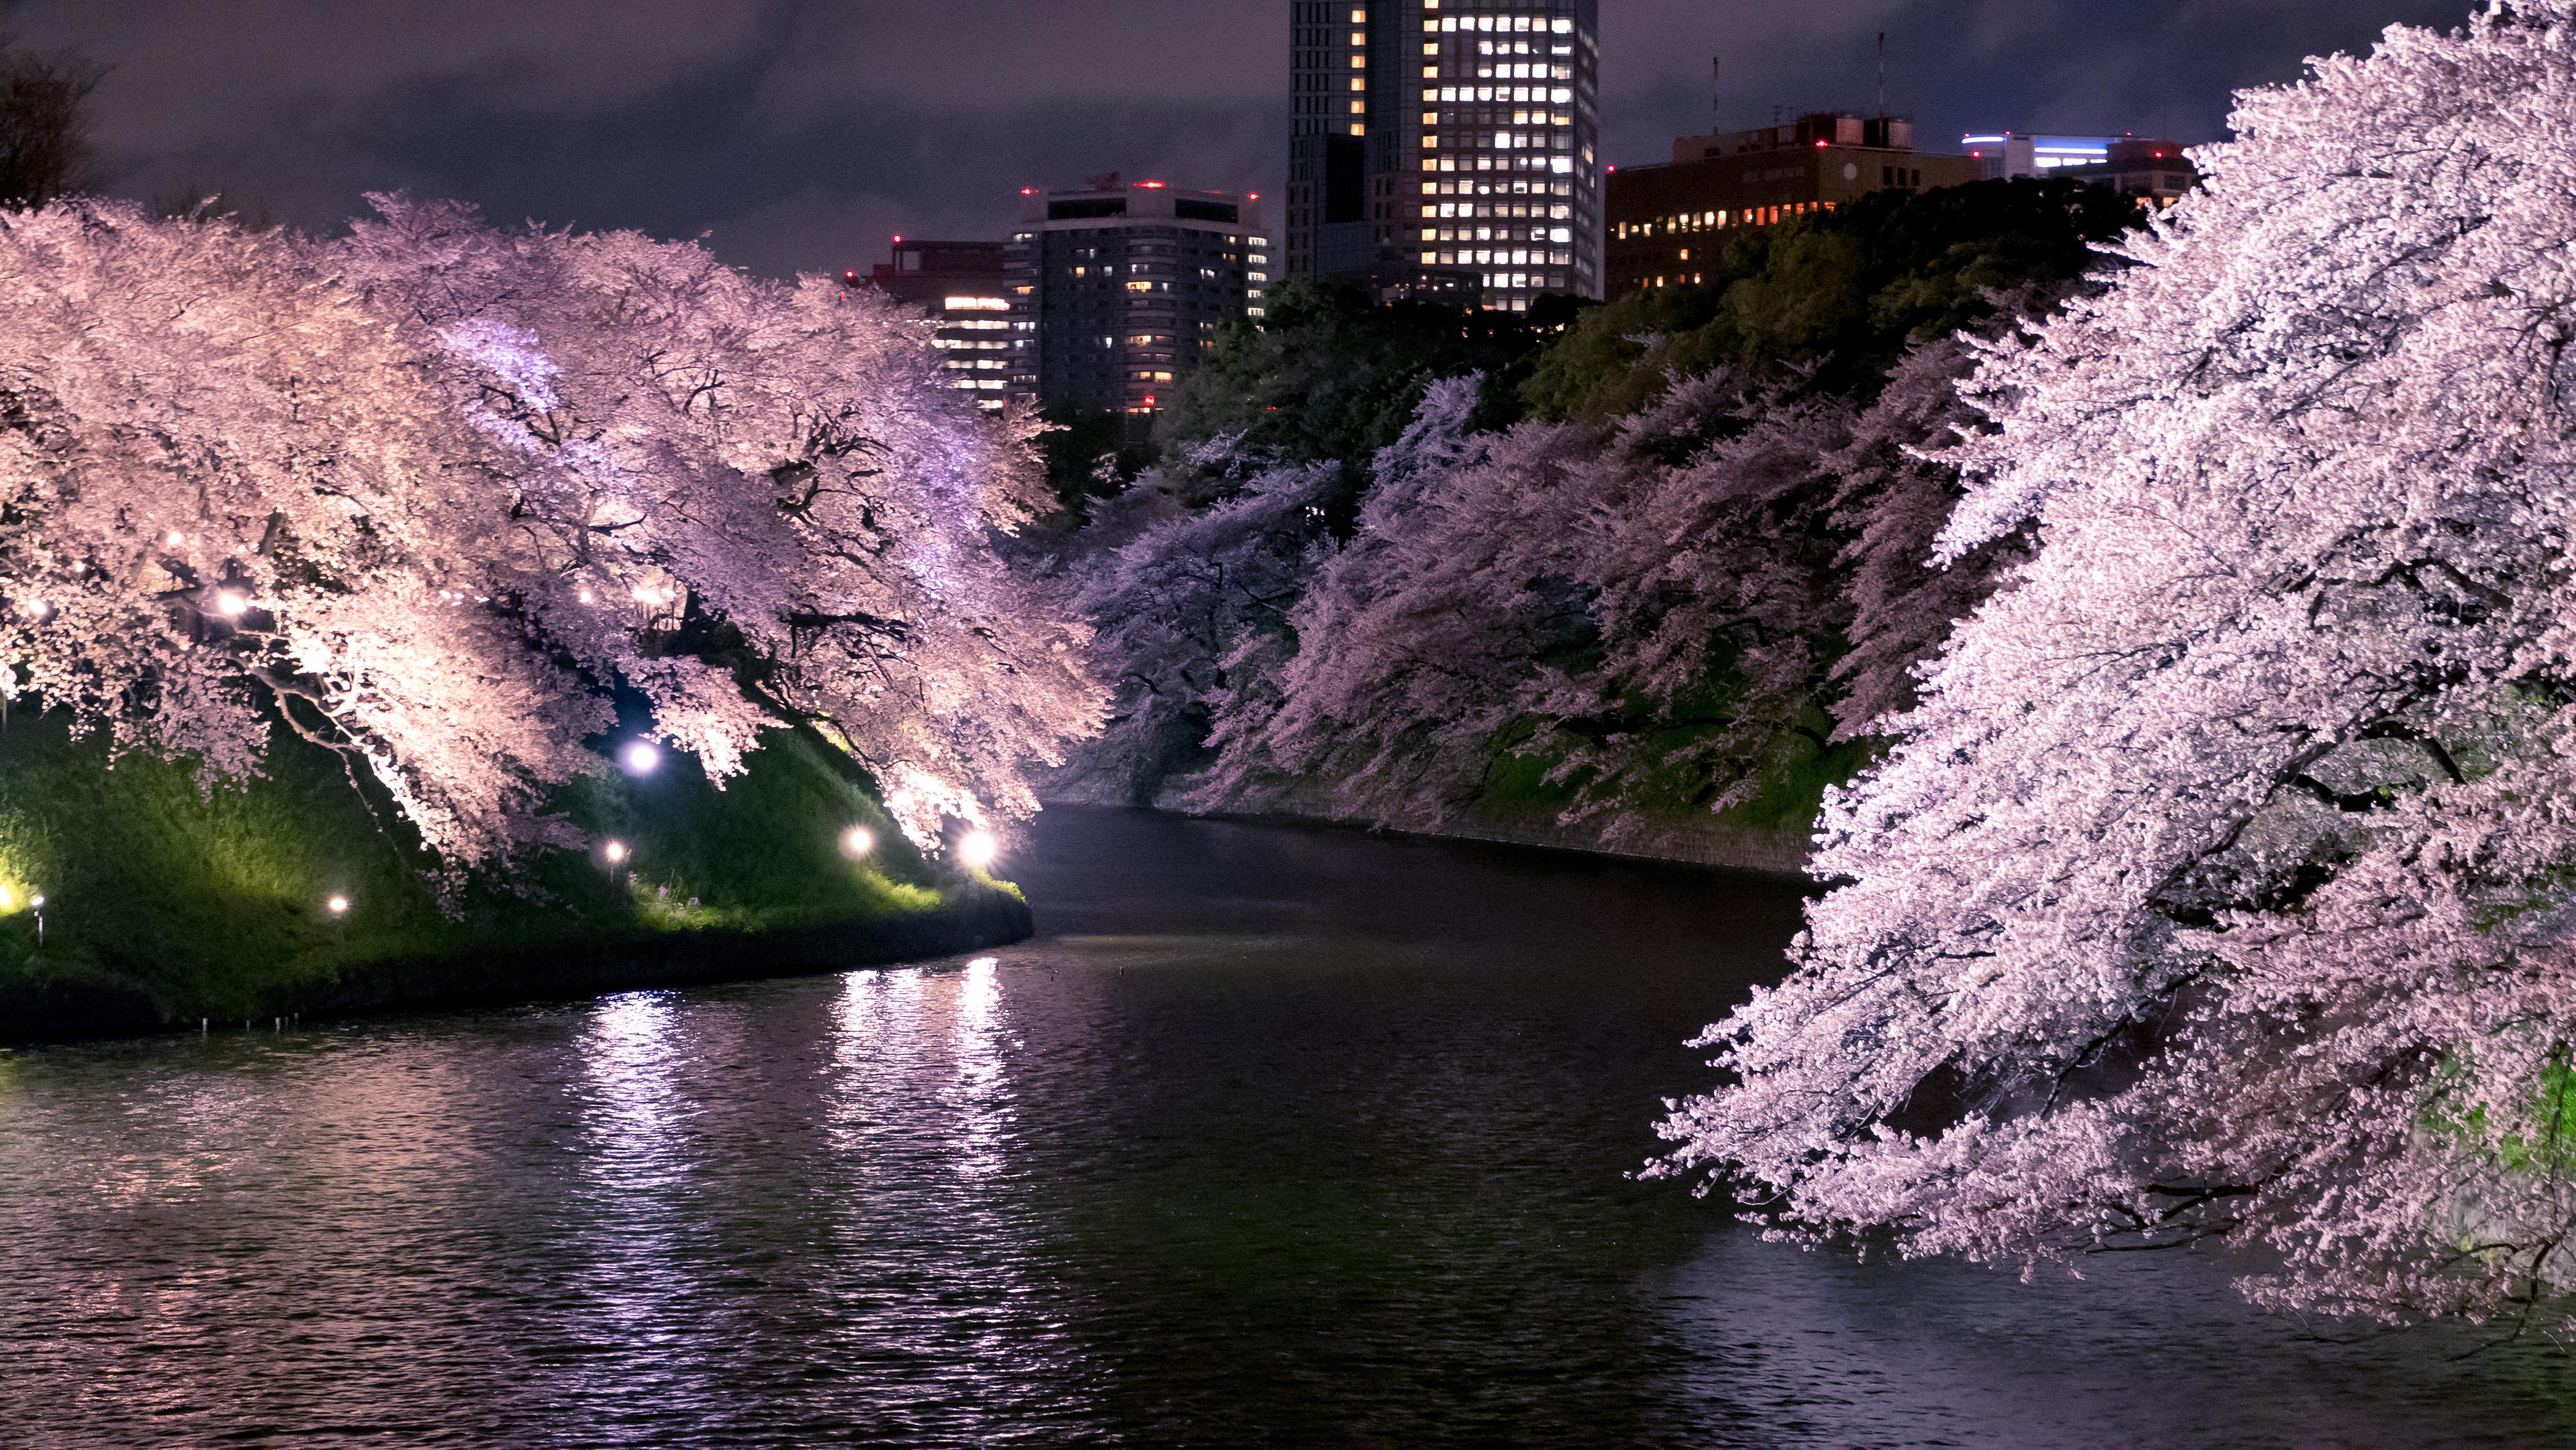 67 wallpaper night cherry blossom referrals best